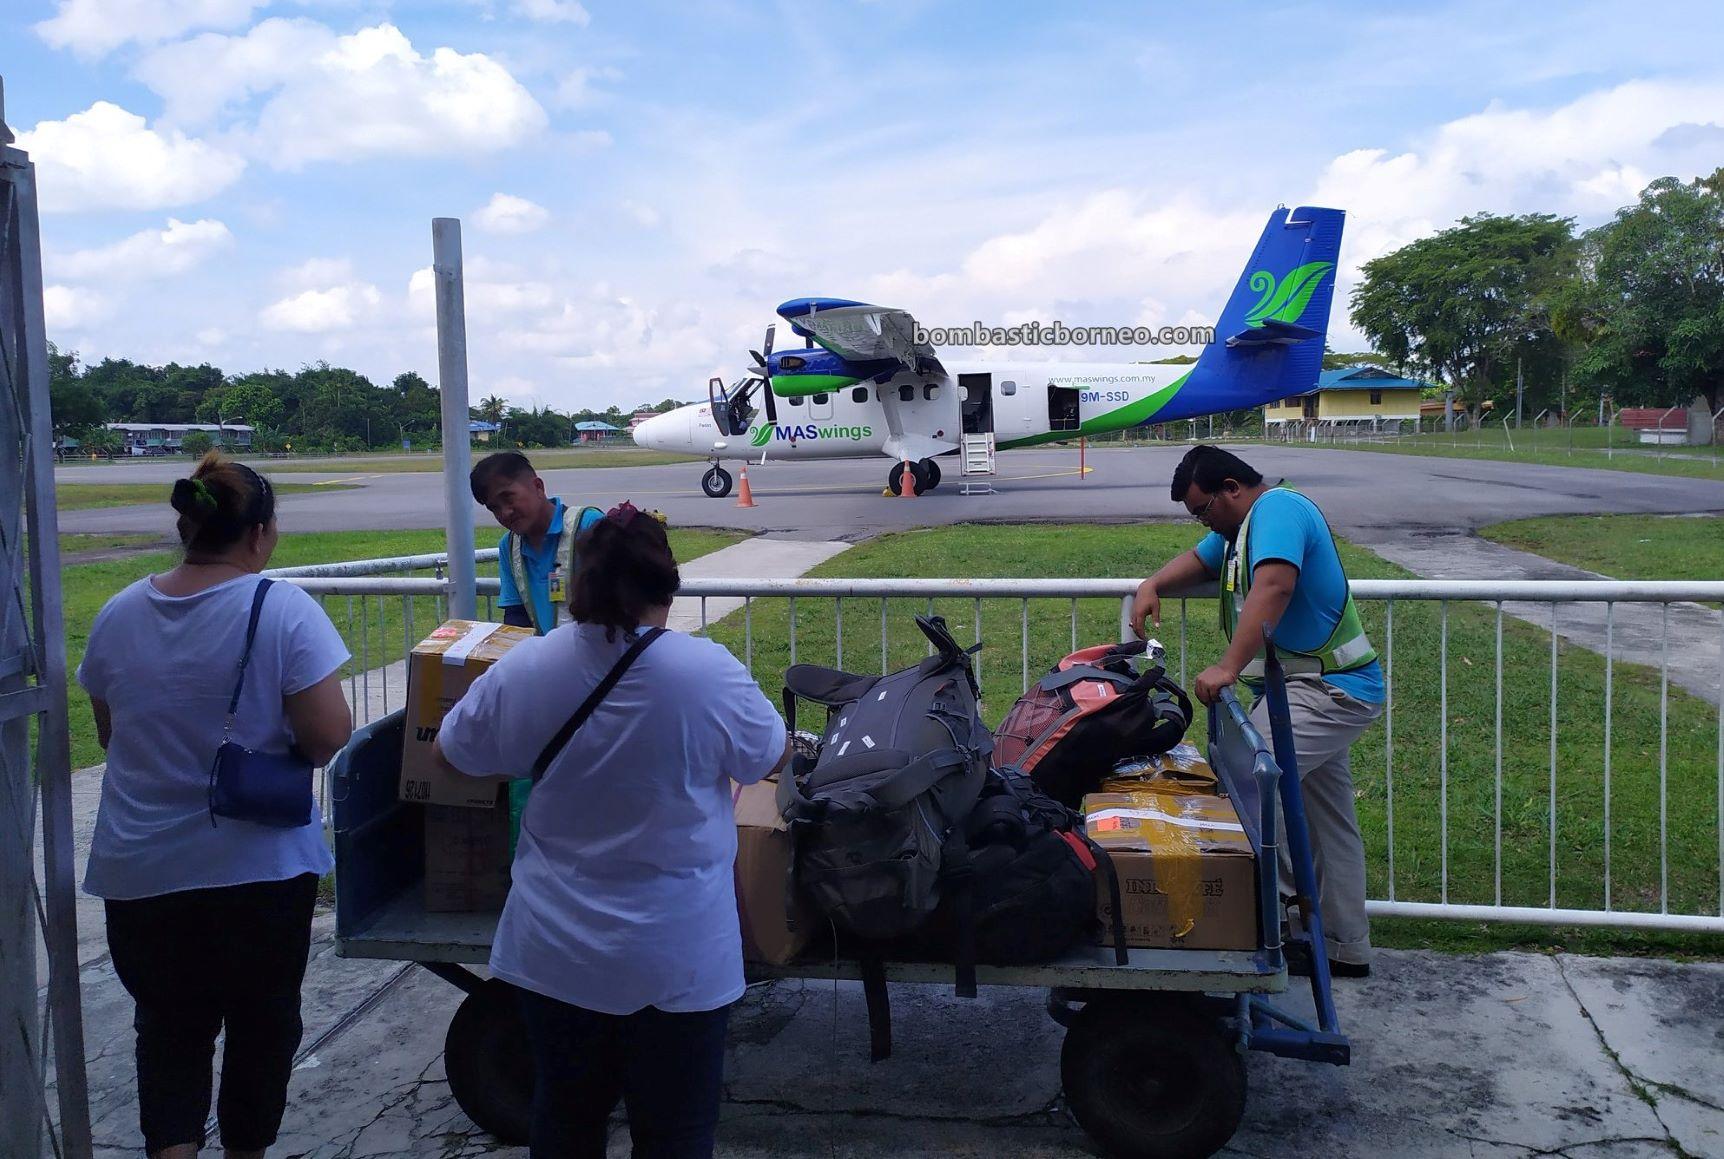 Mas wings, twin otter flight, adventure, Transportation, interior, airport, exploration, Tourism, tourist attraction, Trans Border, Borneo, 跨境婆罗洲游踪, 马来西亚砂拉越, 马鲁帝机场